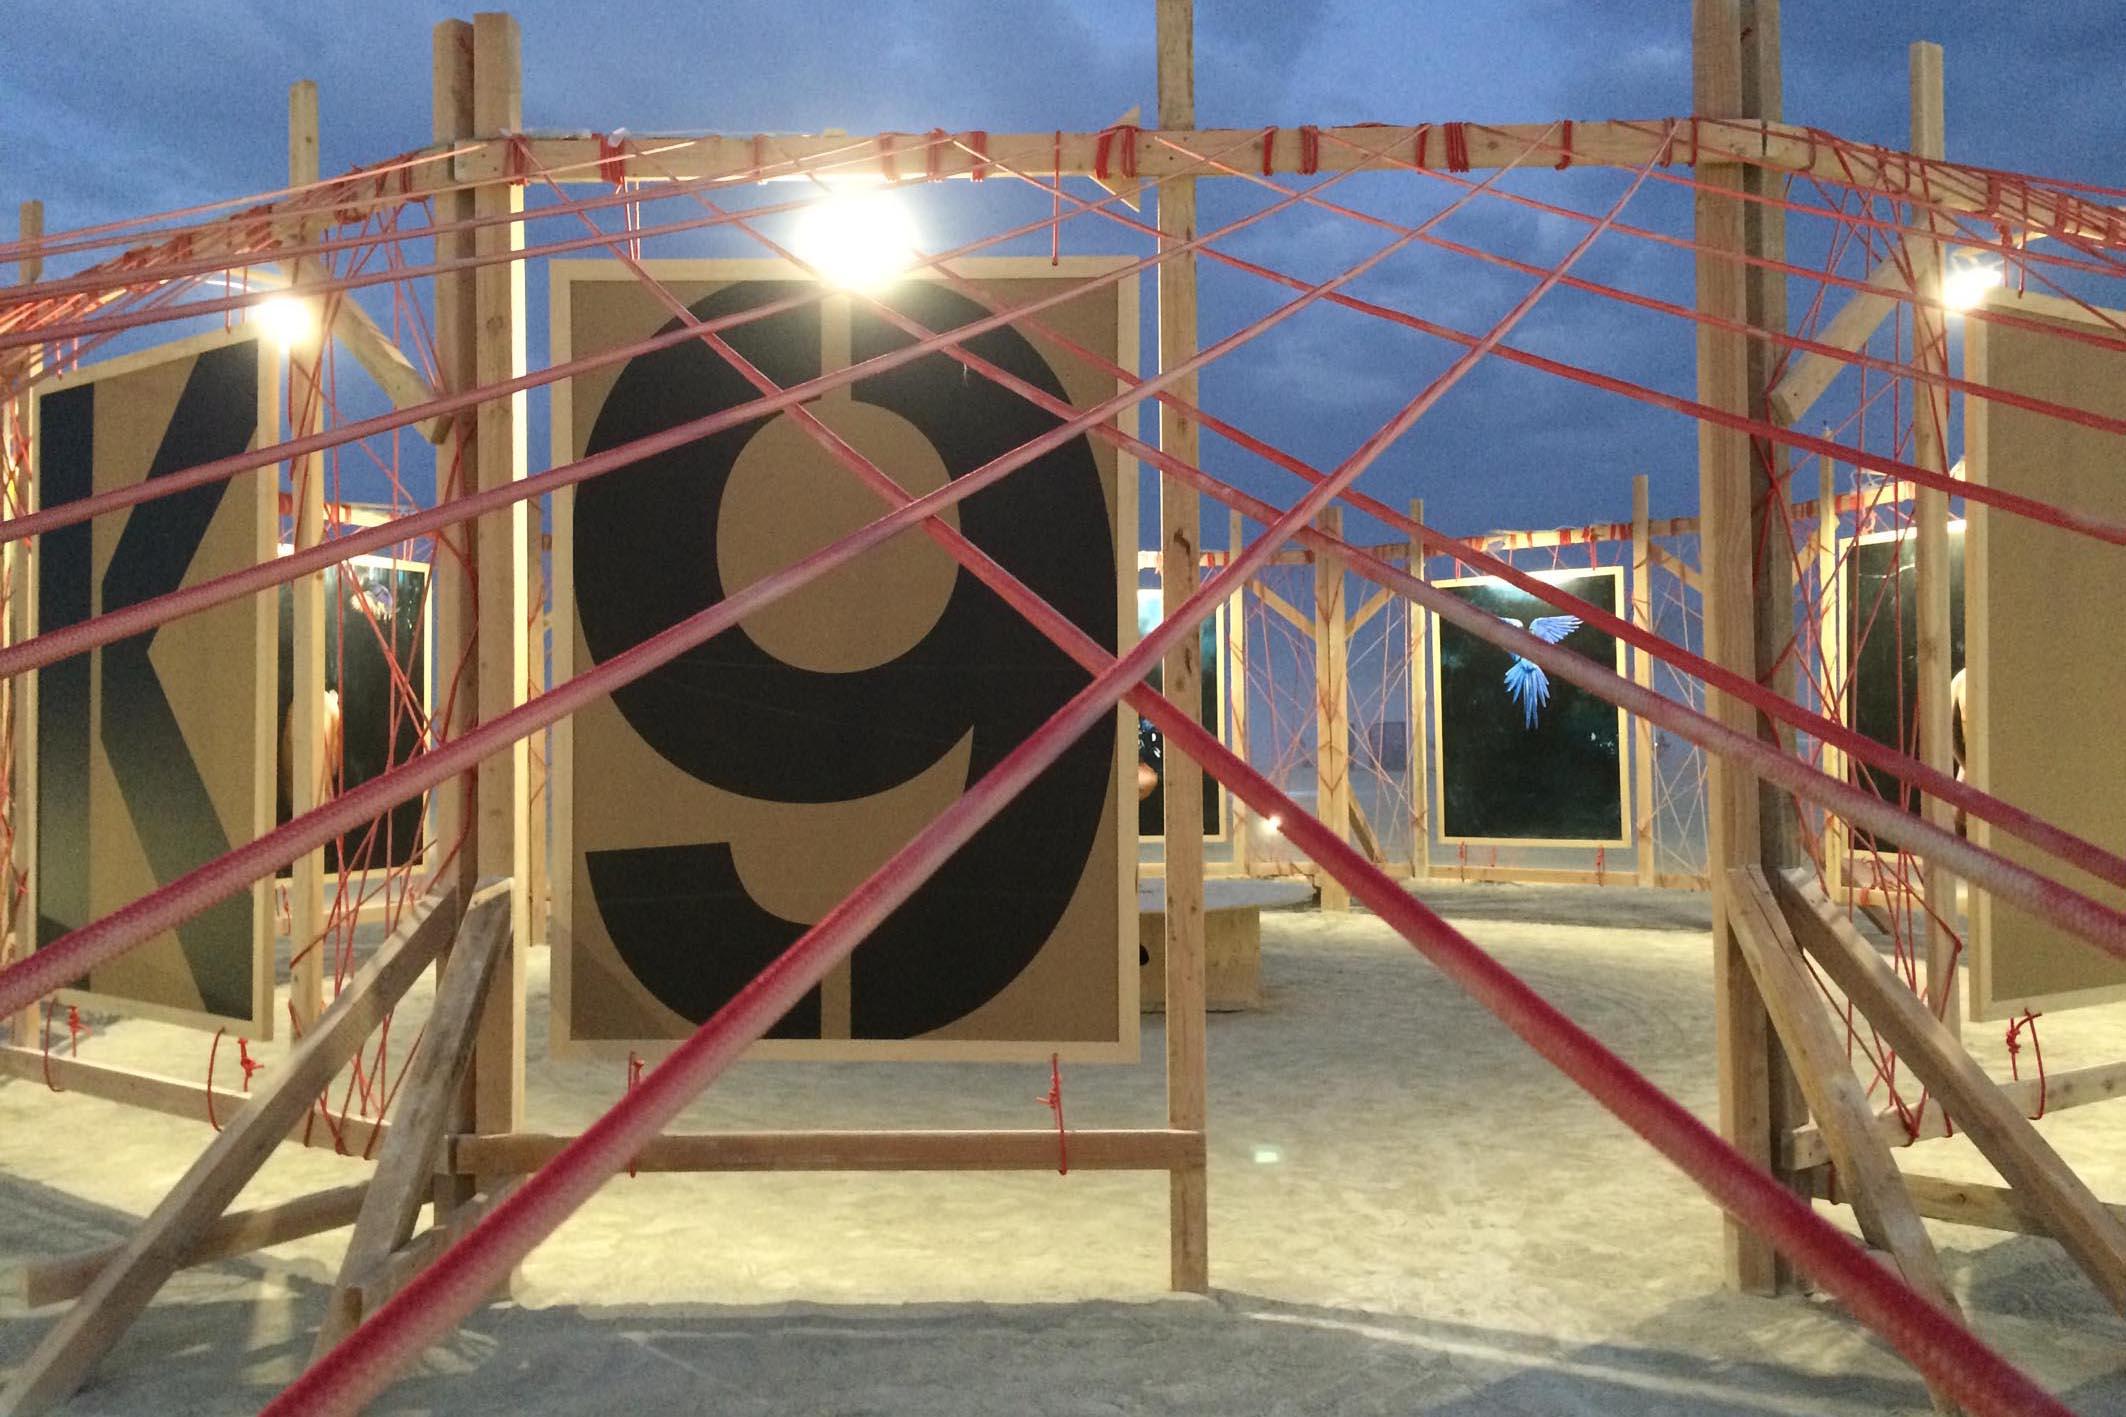 BurningMan 2017 Radical Rituals Art Project Installation 10